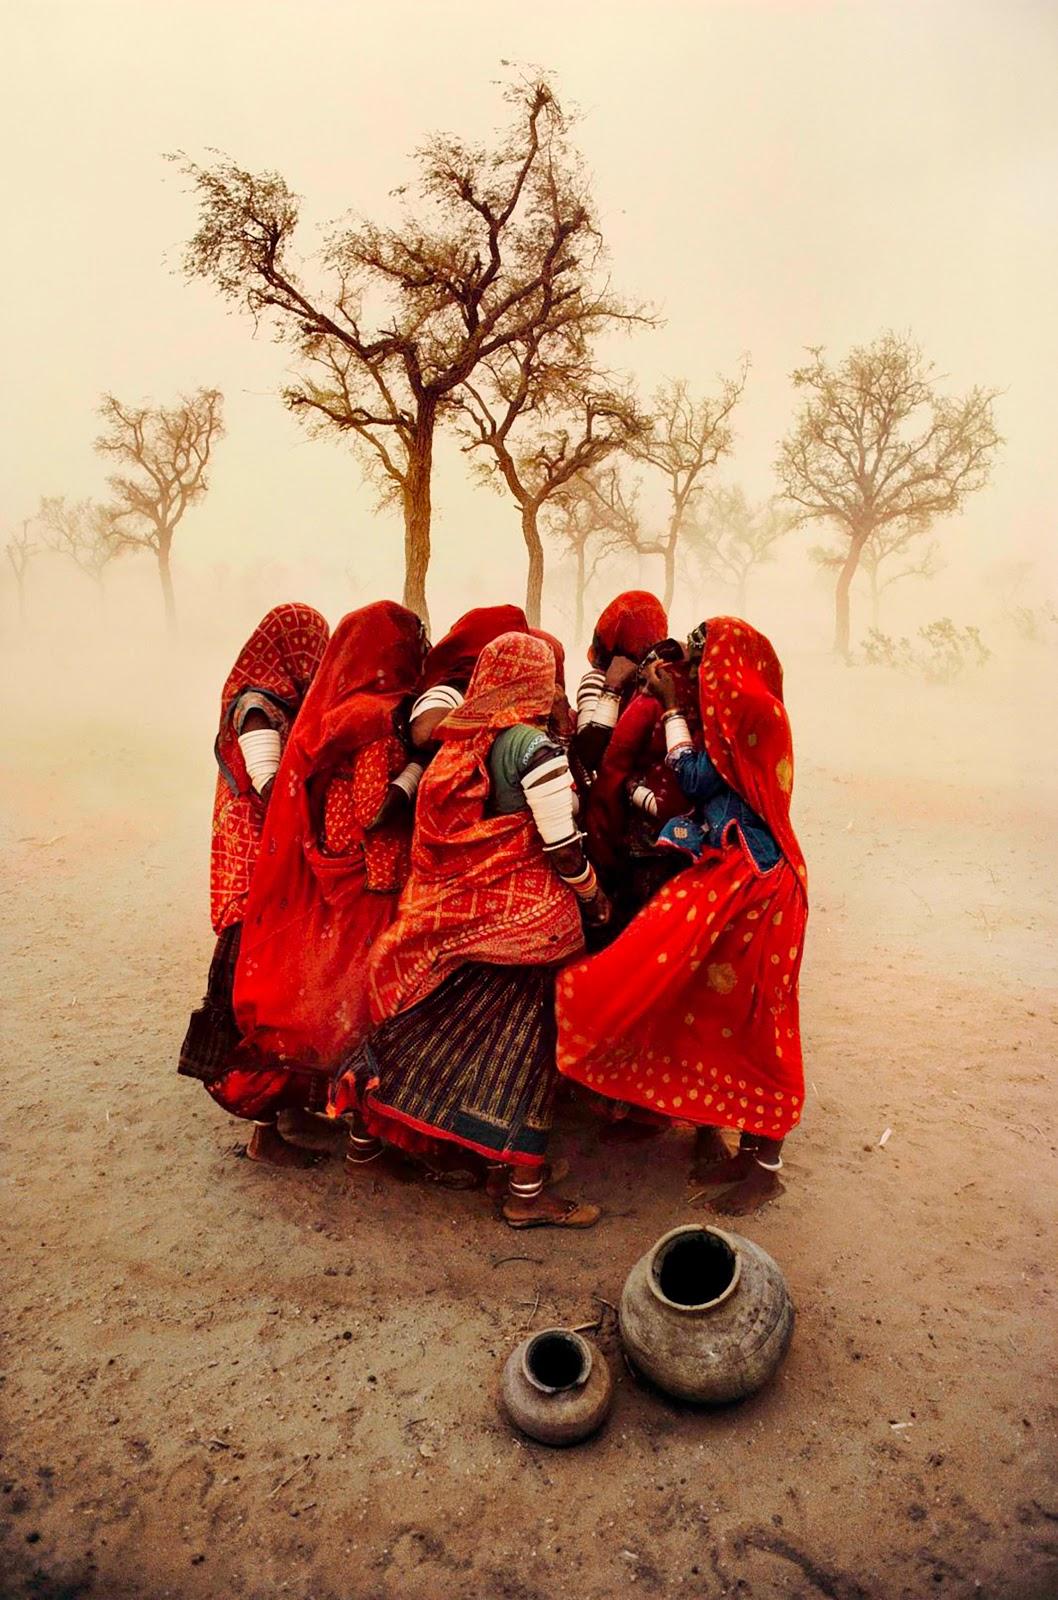 Steve McCurry, Rajasthan, India